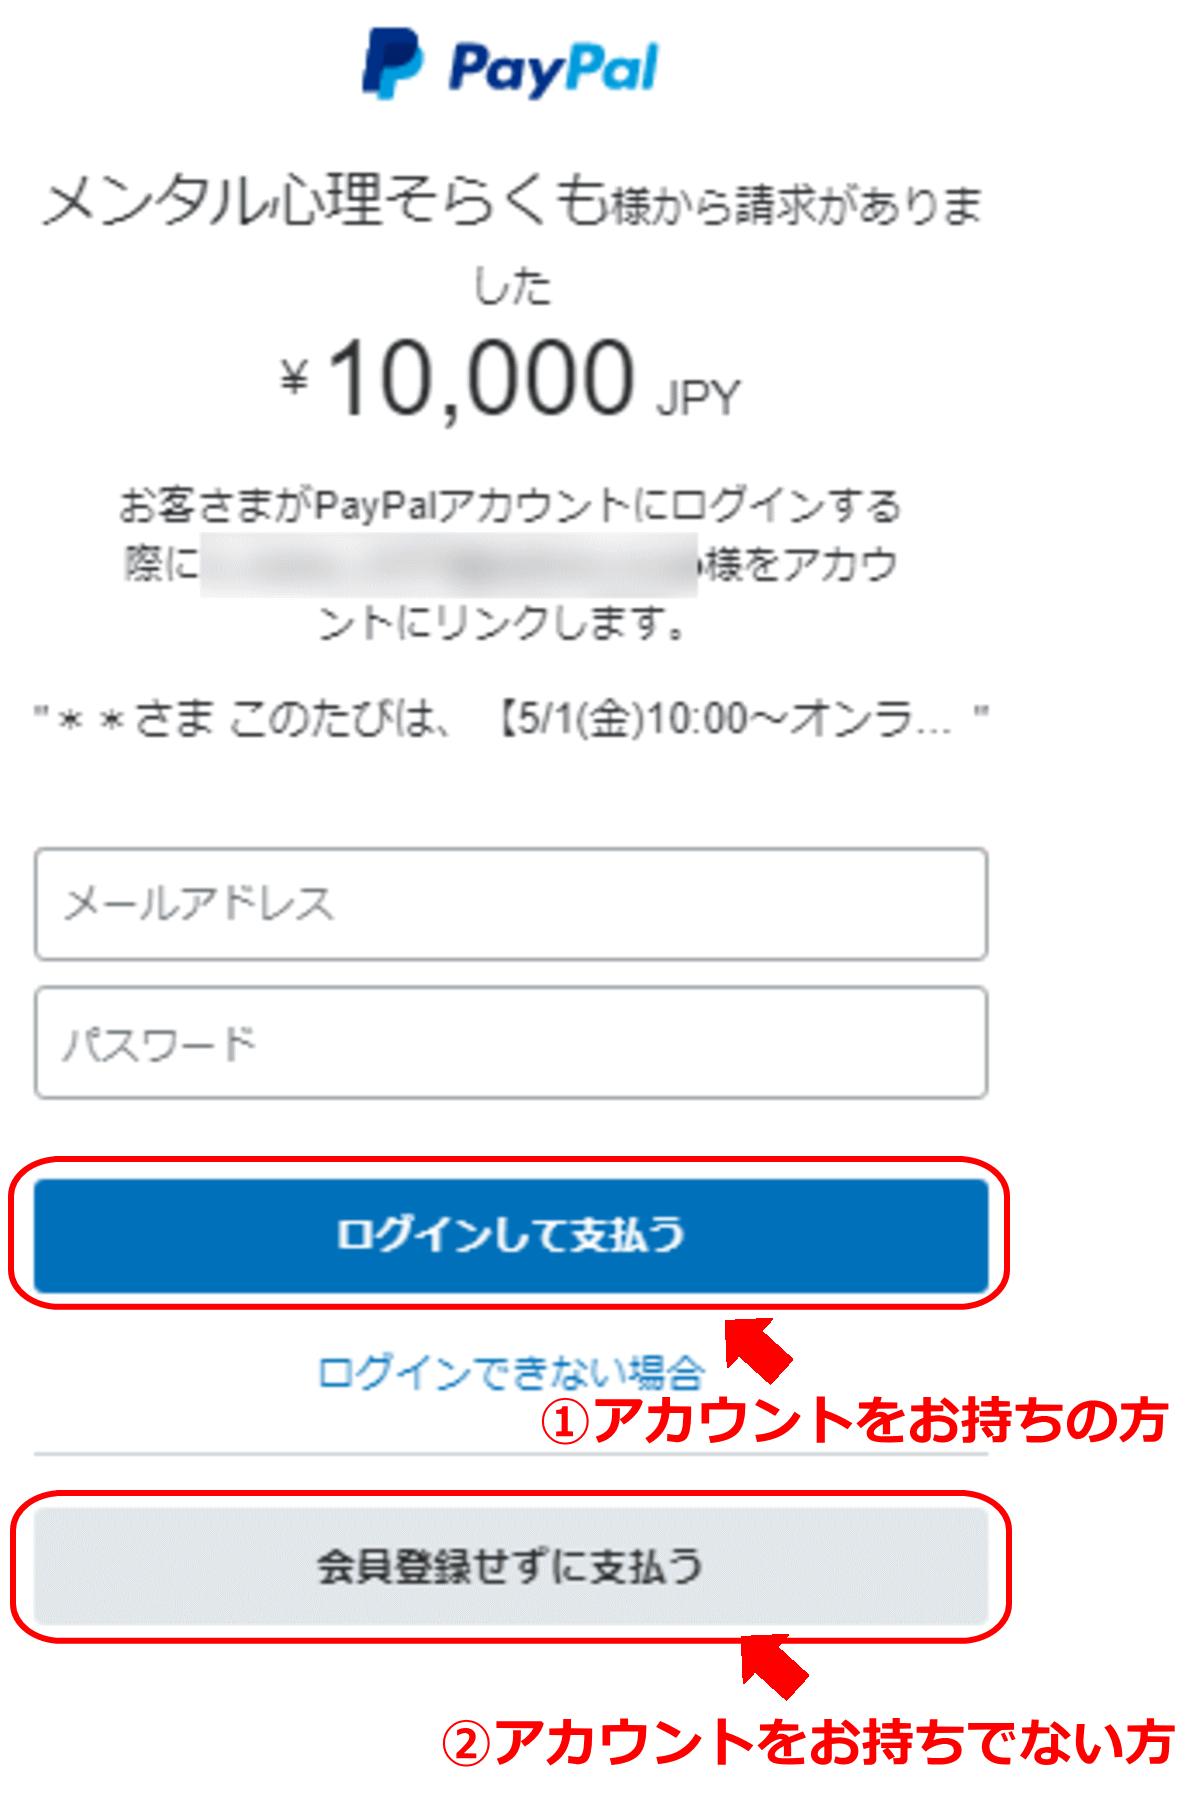 paypalログイン画面のイメージ